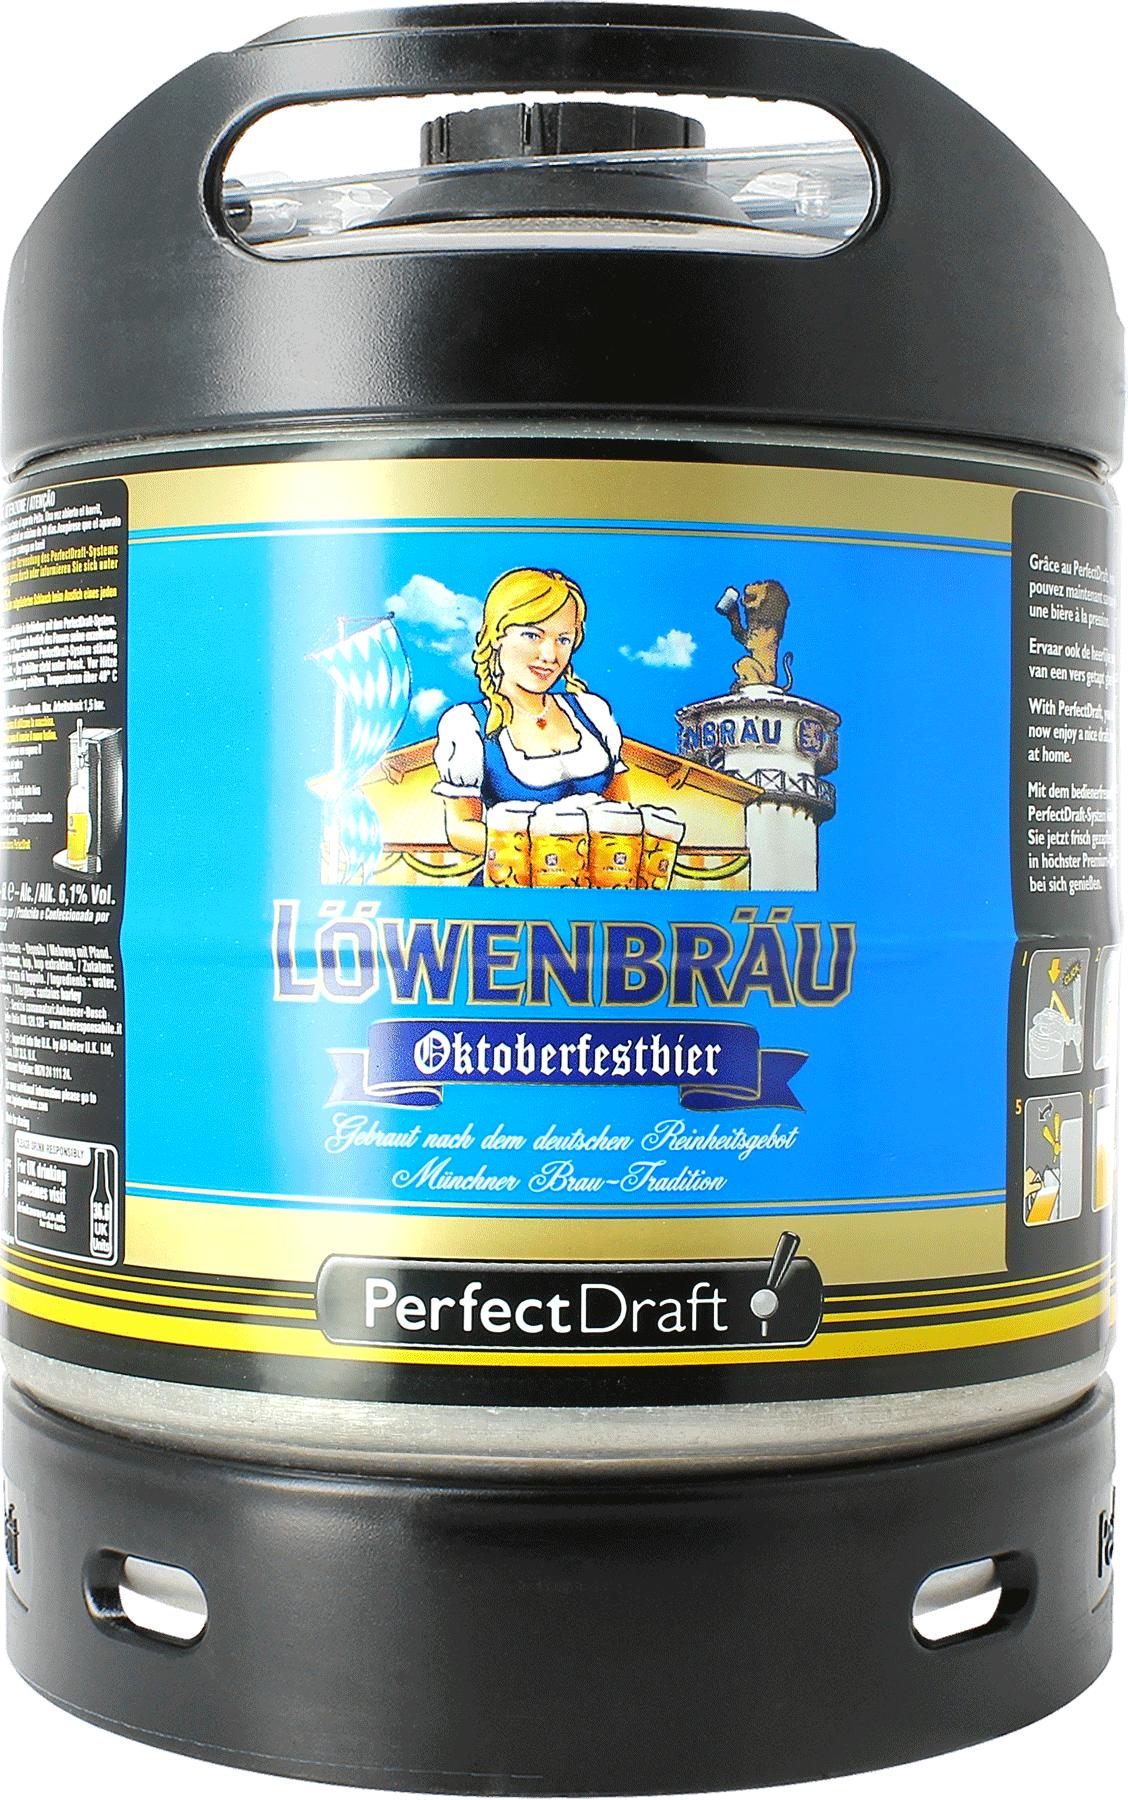 Löwenbräu Oktoberfestbier PerfectDraft 6-litre Barril